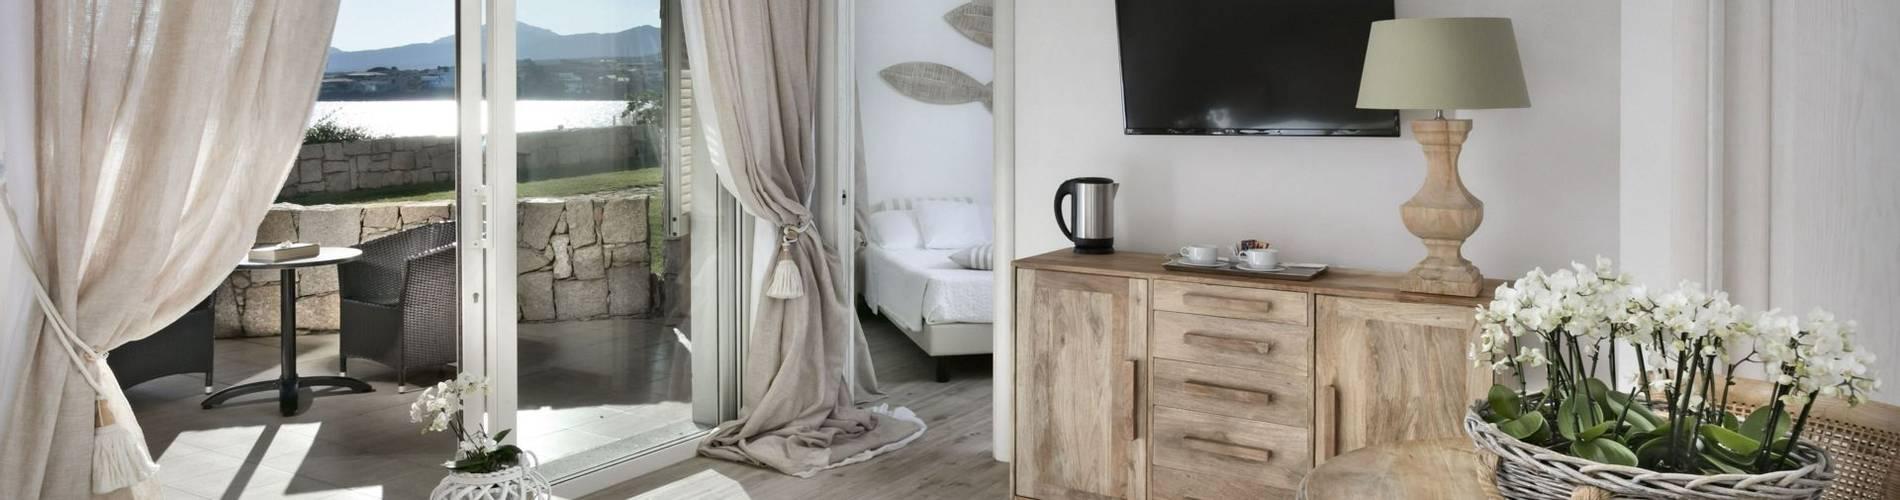 Charming Suite - Gabbiano Azzurro Hotel _ Suites Sardegna - stampa1.jpg